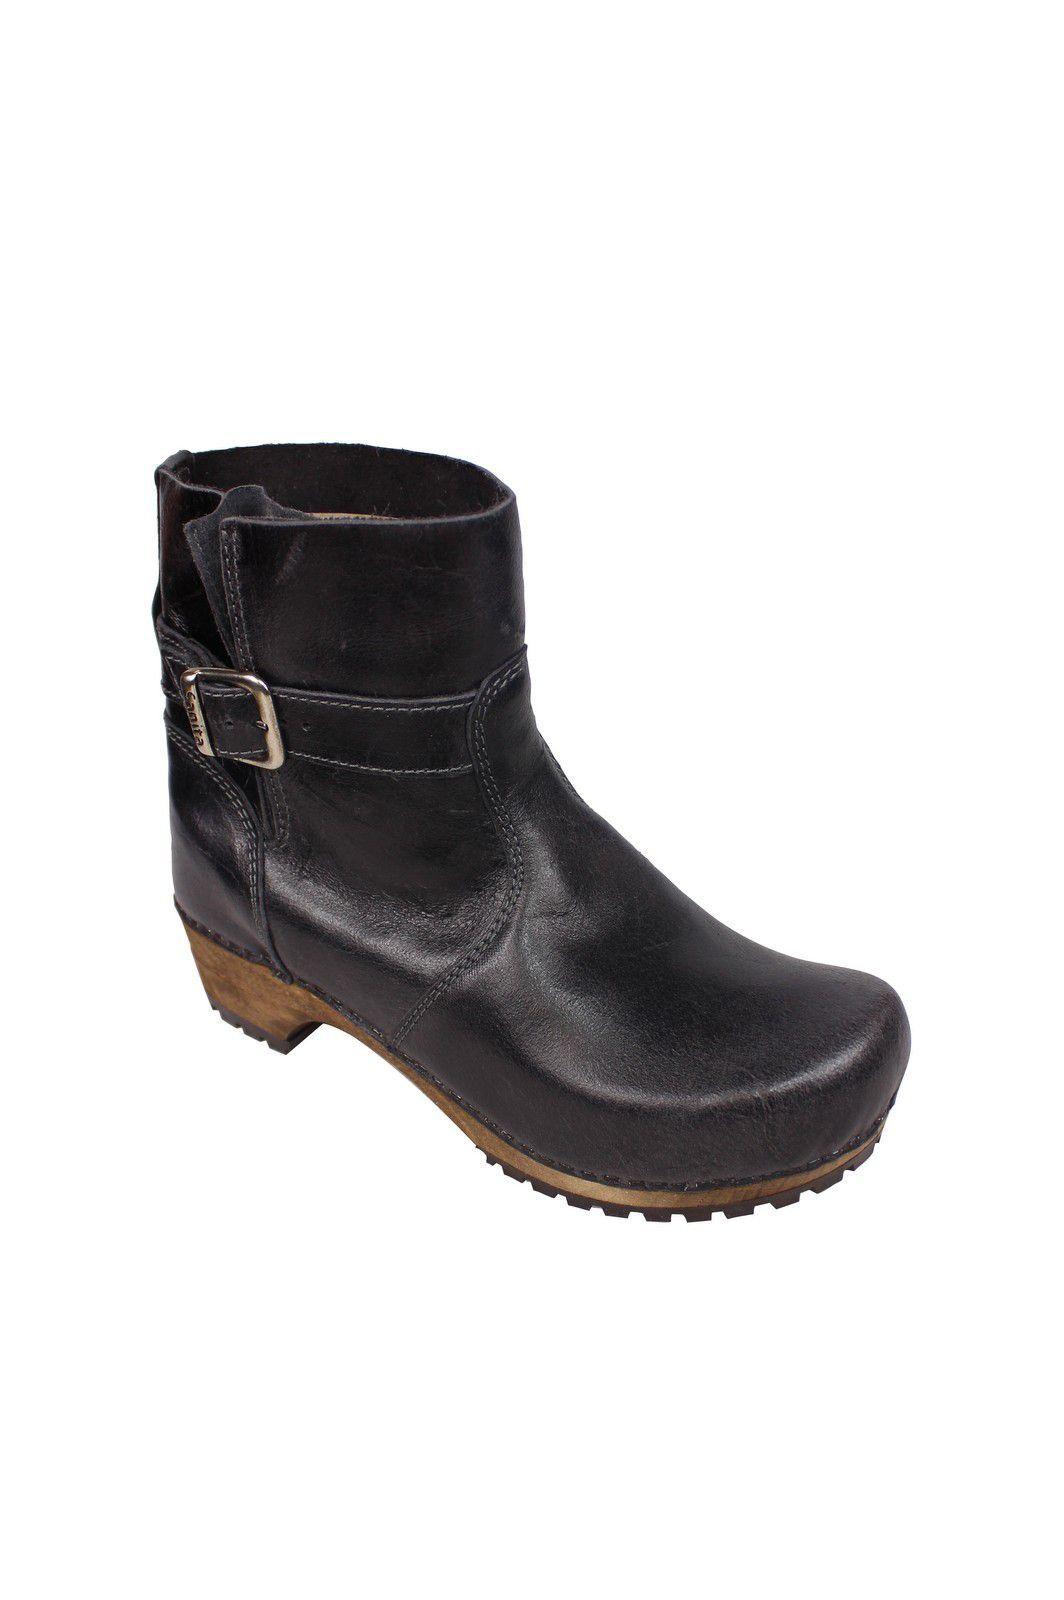 Sanita Mina Low Classic Clog Boot Black 452330